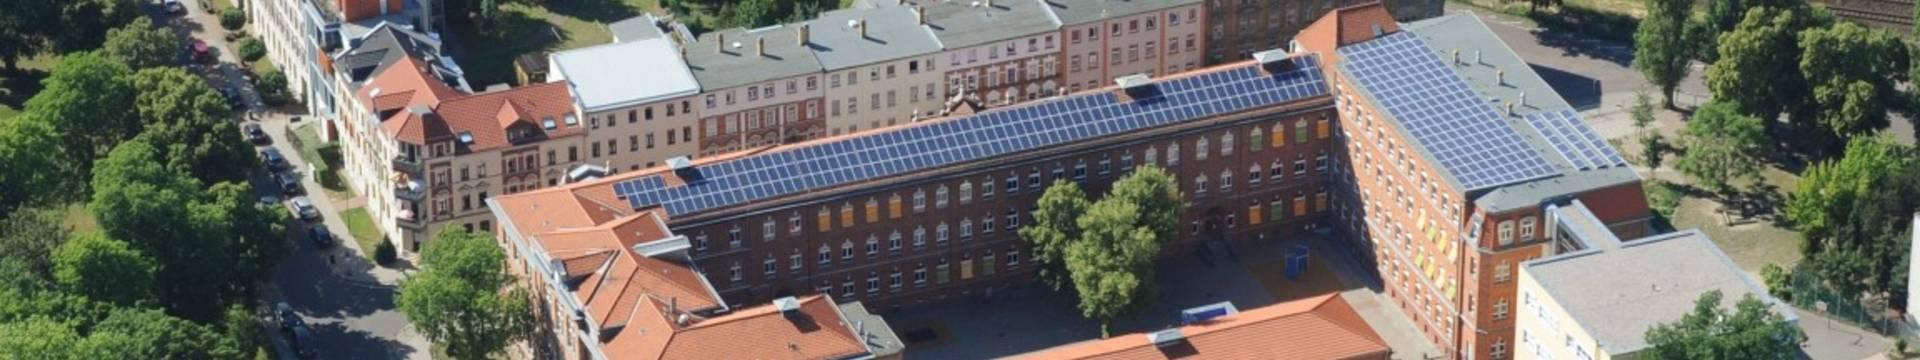 photovoltaikanlage schulkomplex